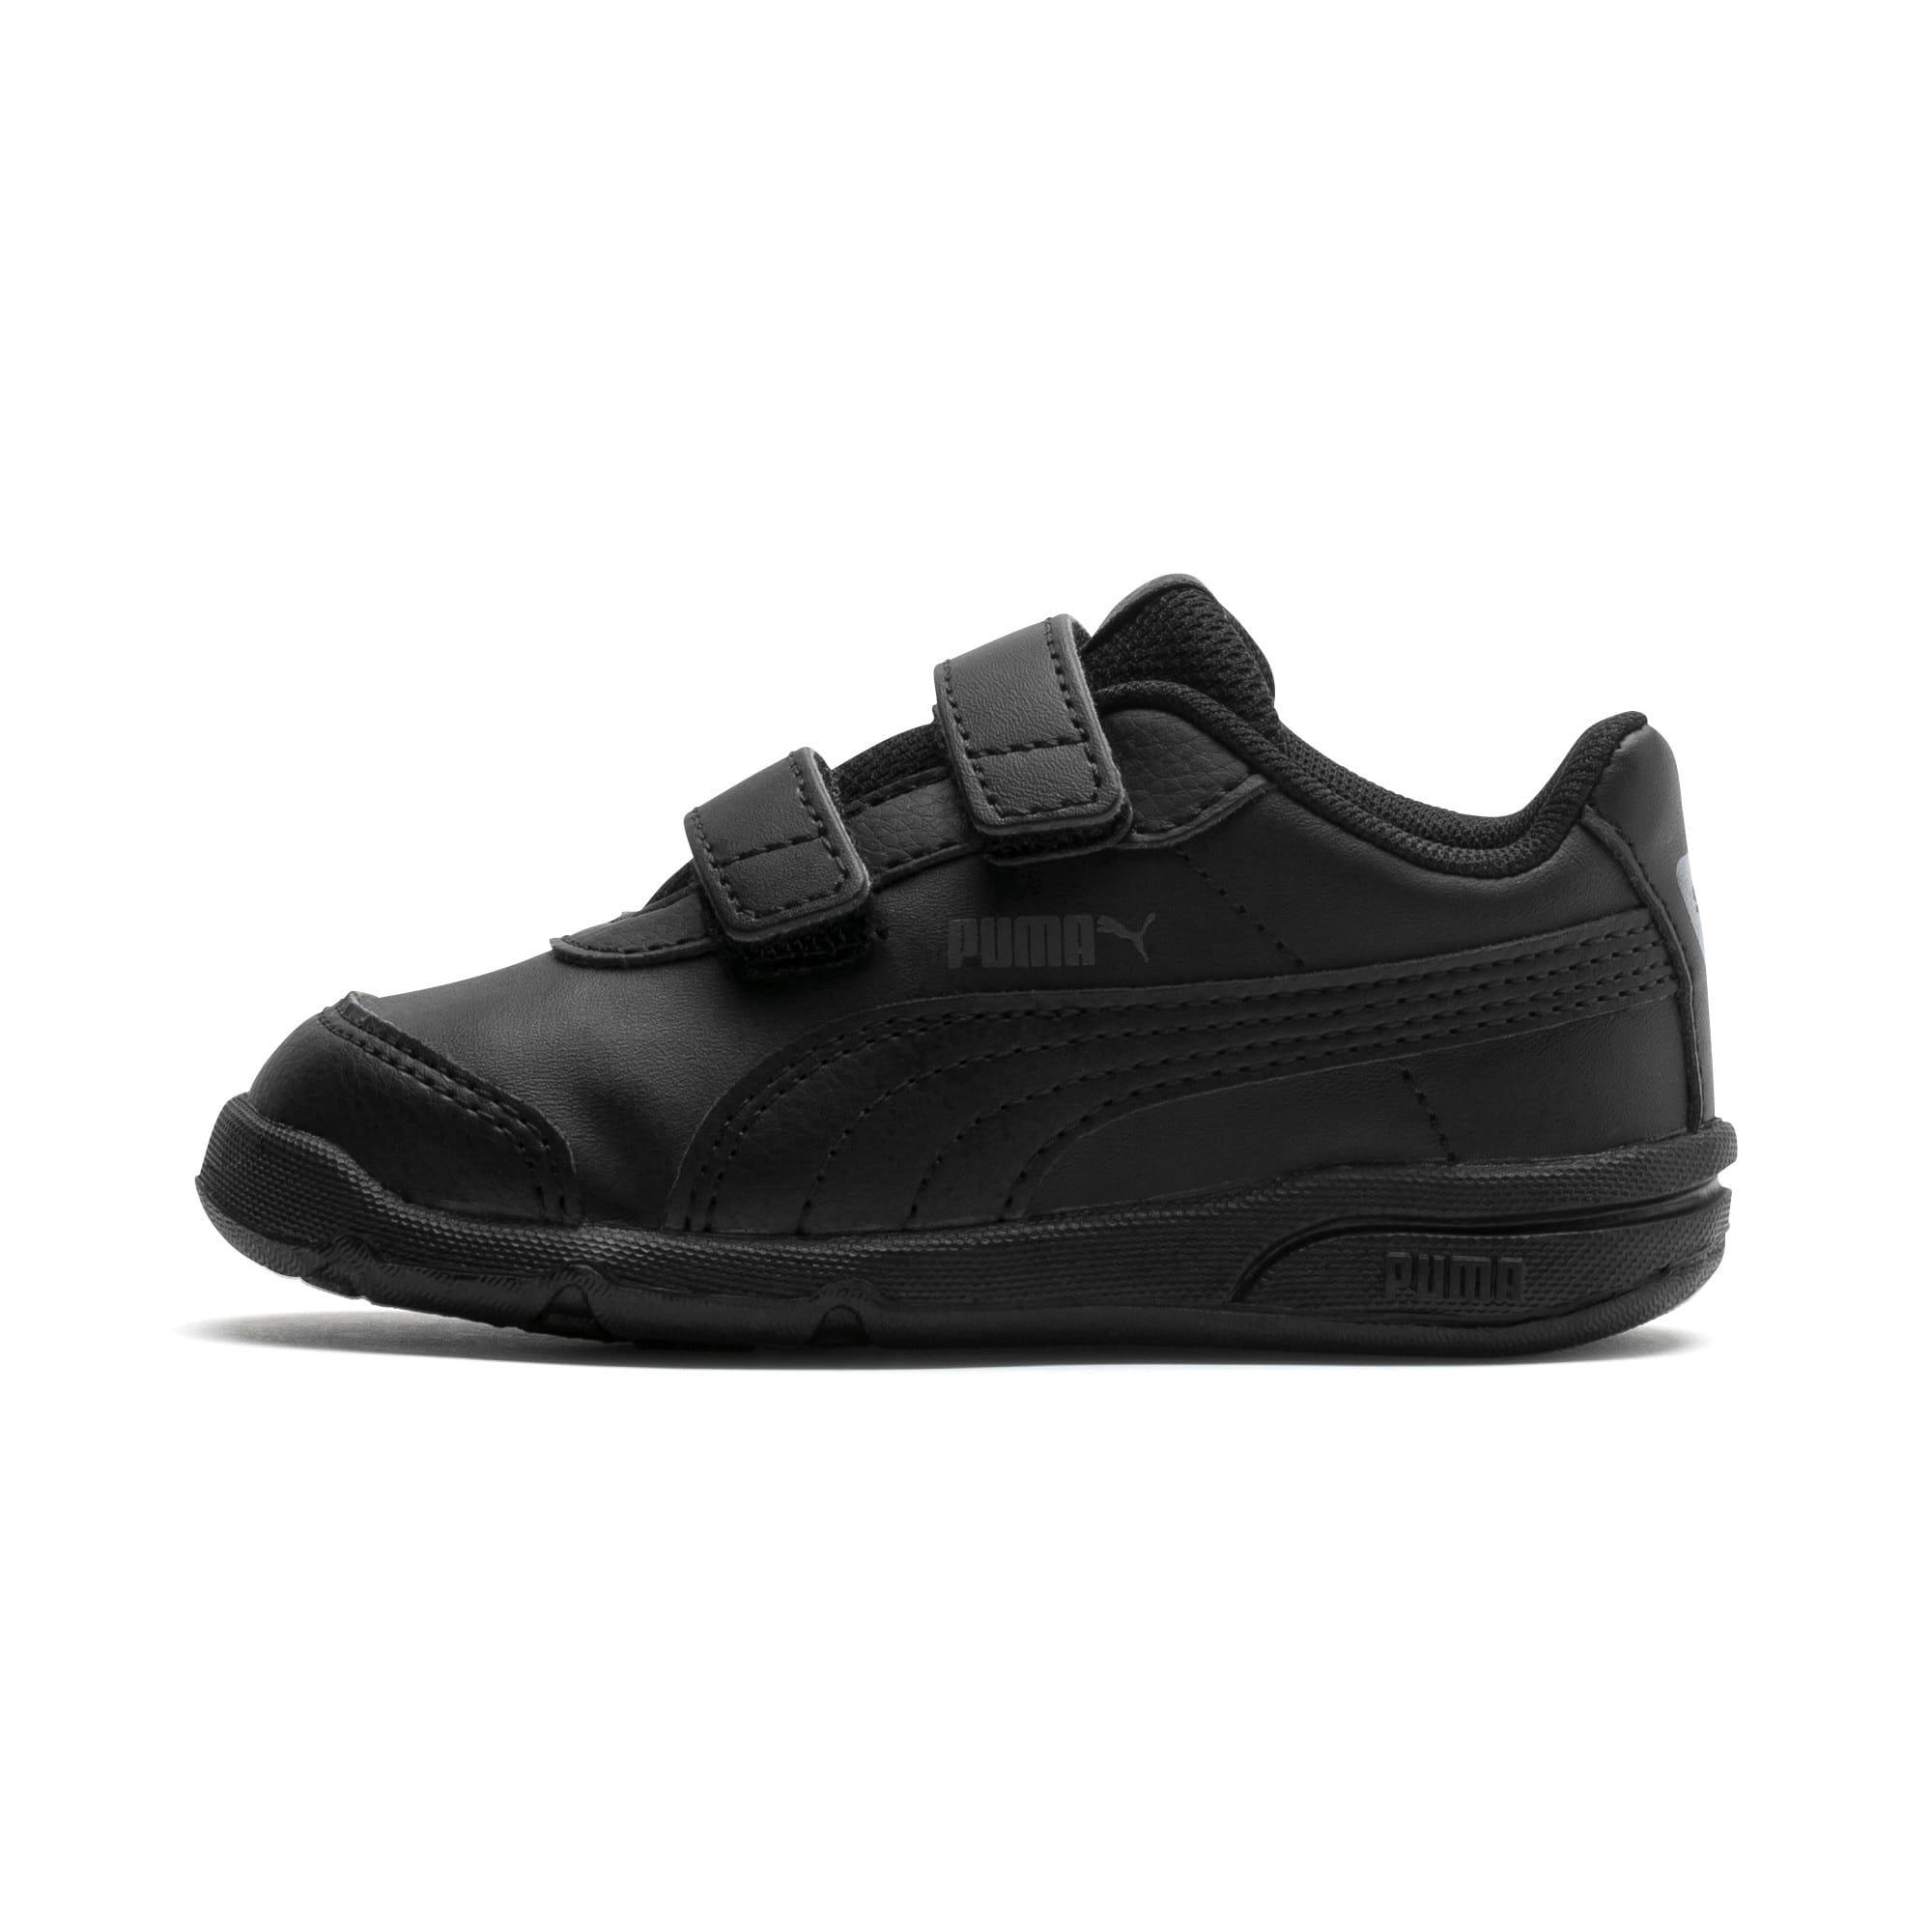 Thumbnail 1 of Basket Stepfleex 2 SL VE V pour bébé, Puma Black-Puma Black, medium